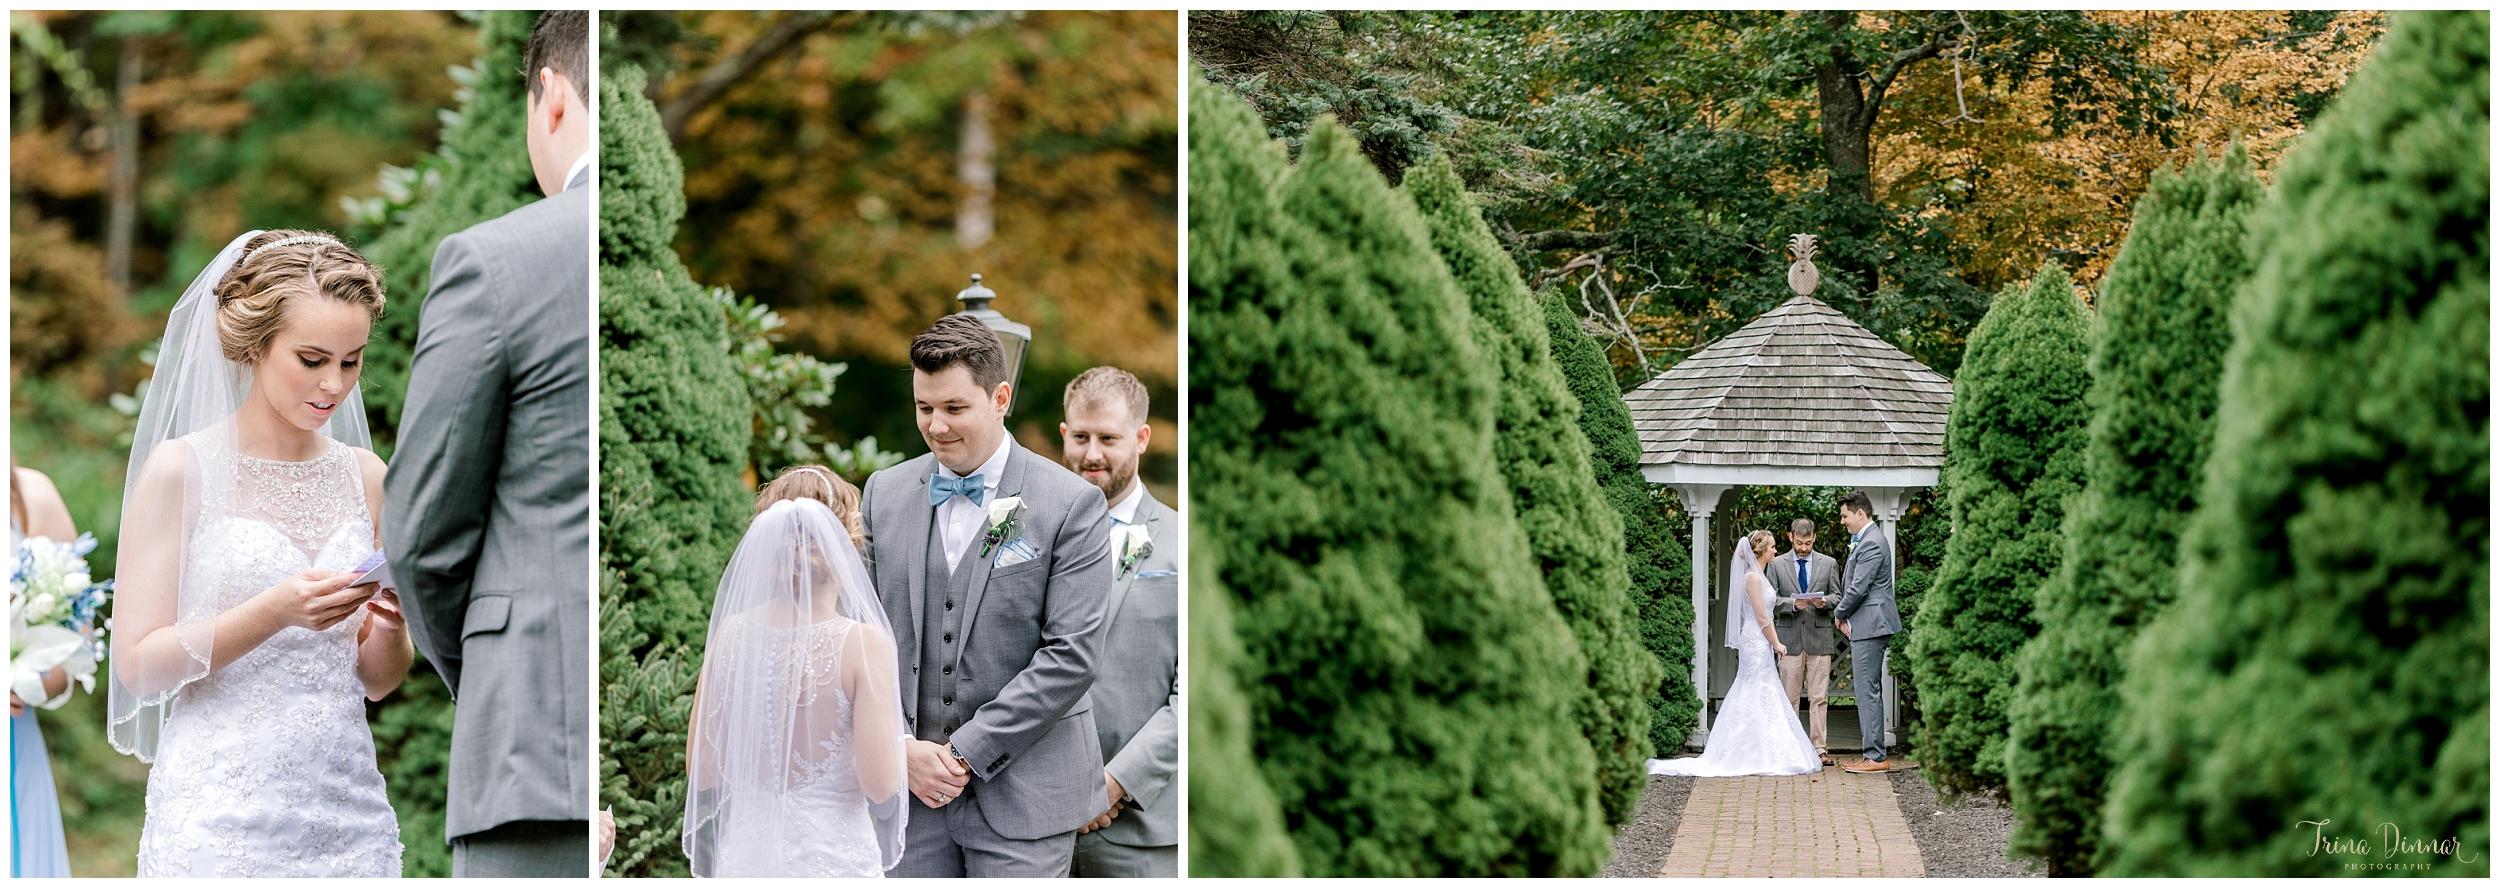 Cape Neddick Maine Clay Hill Farm fall wedding ceremony